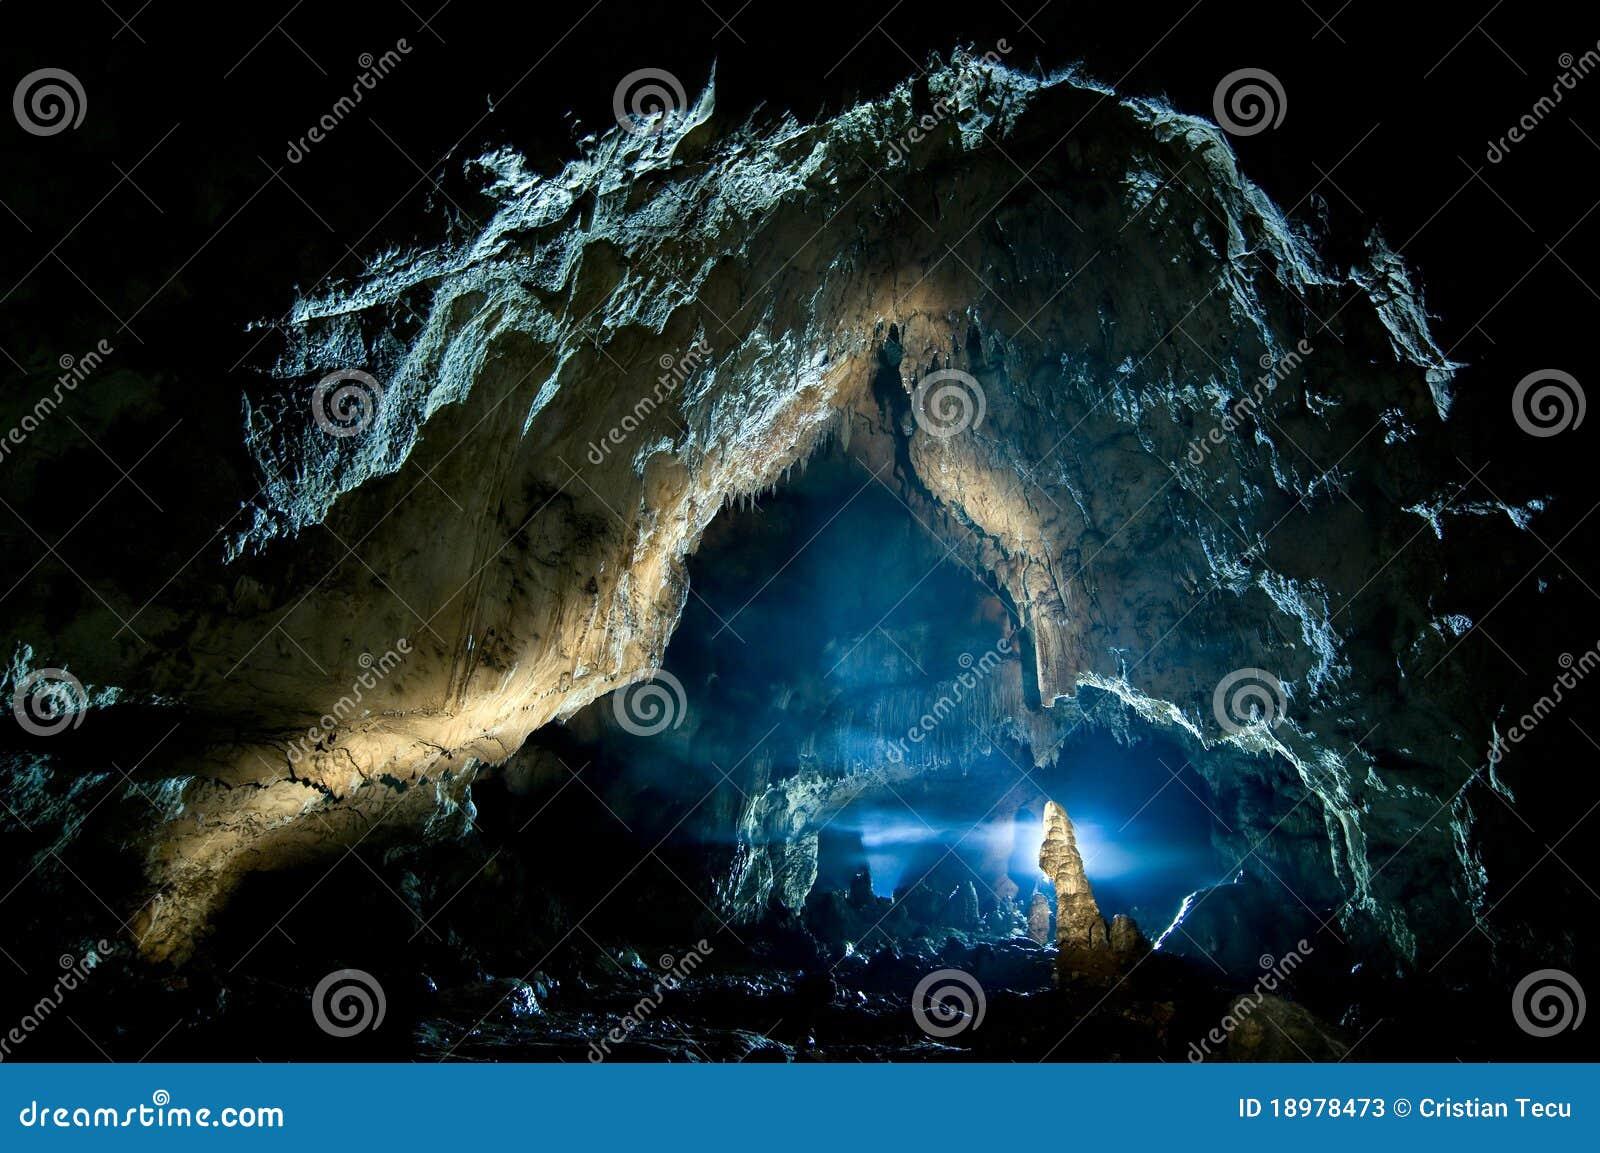 Caverna de Fanate